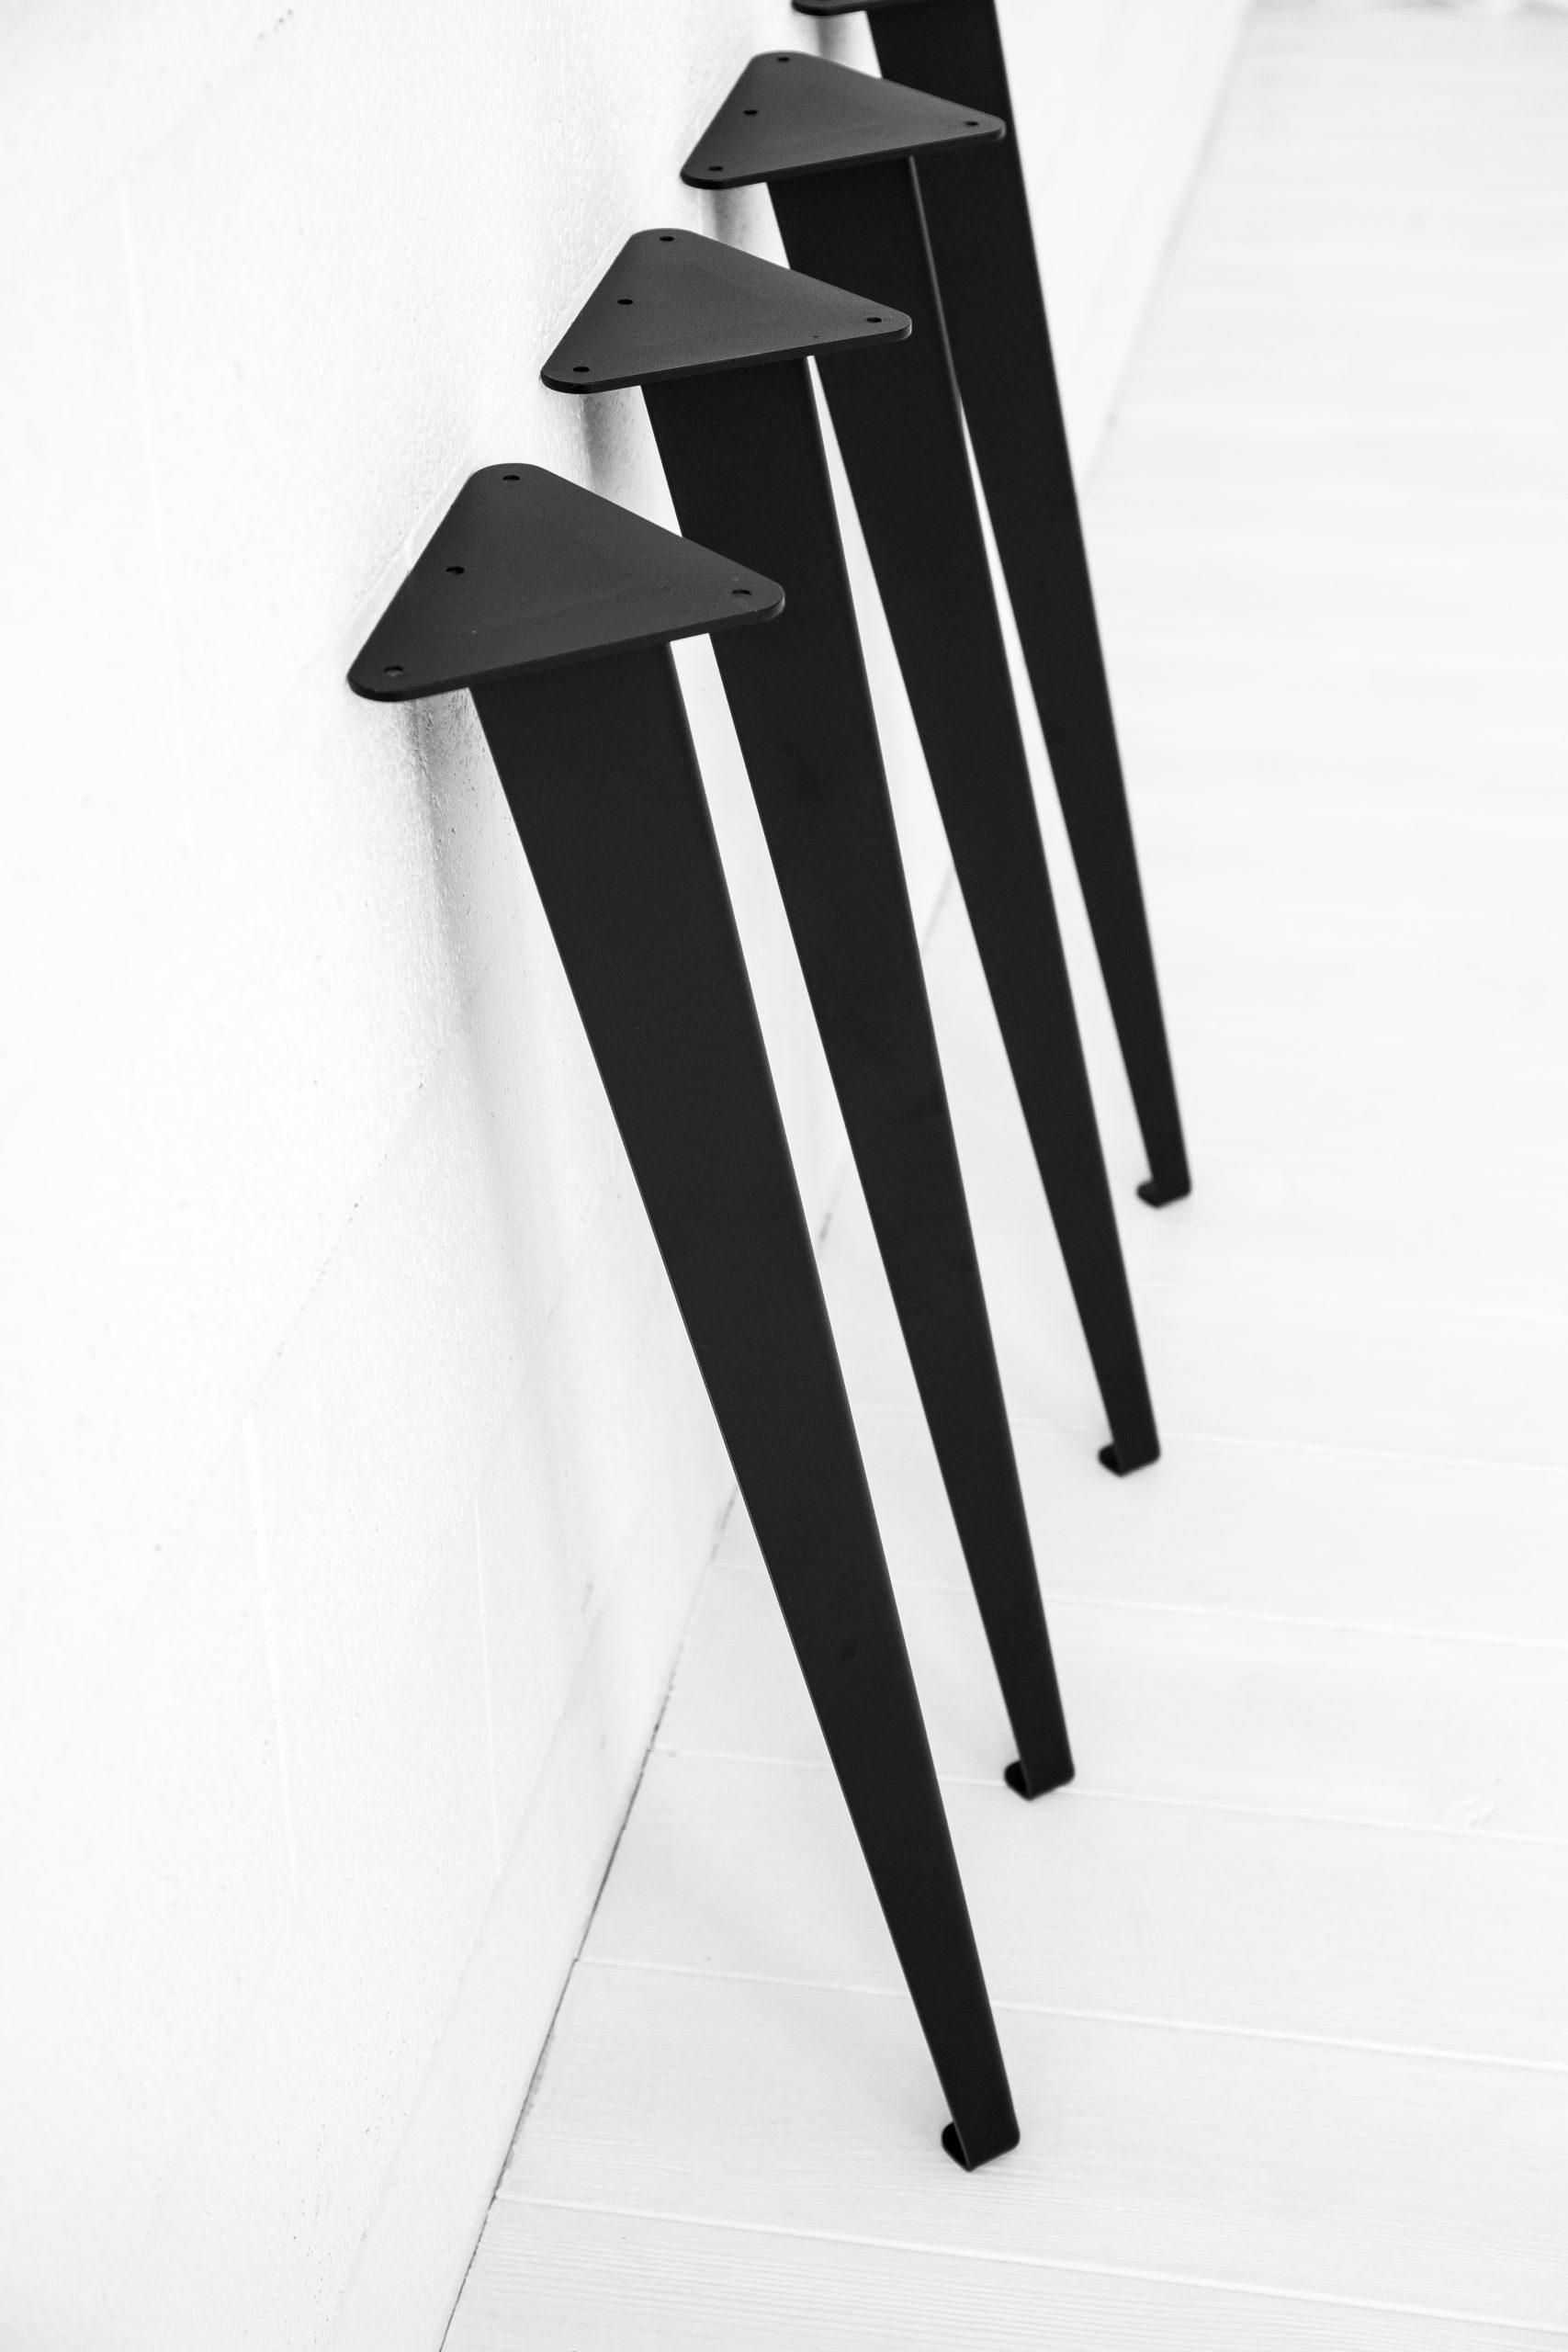 SIMPLE stalas